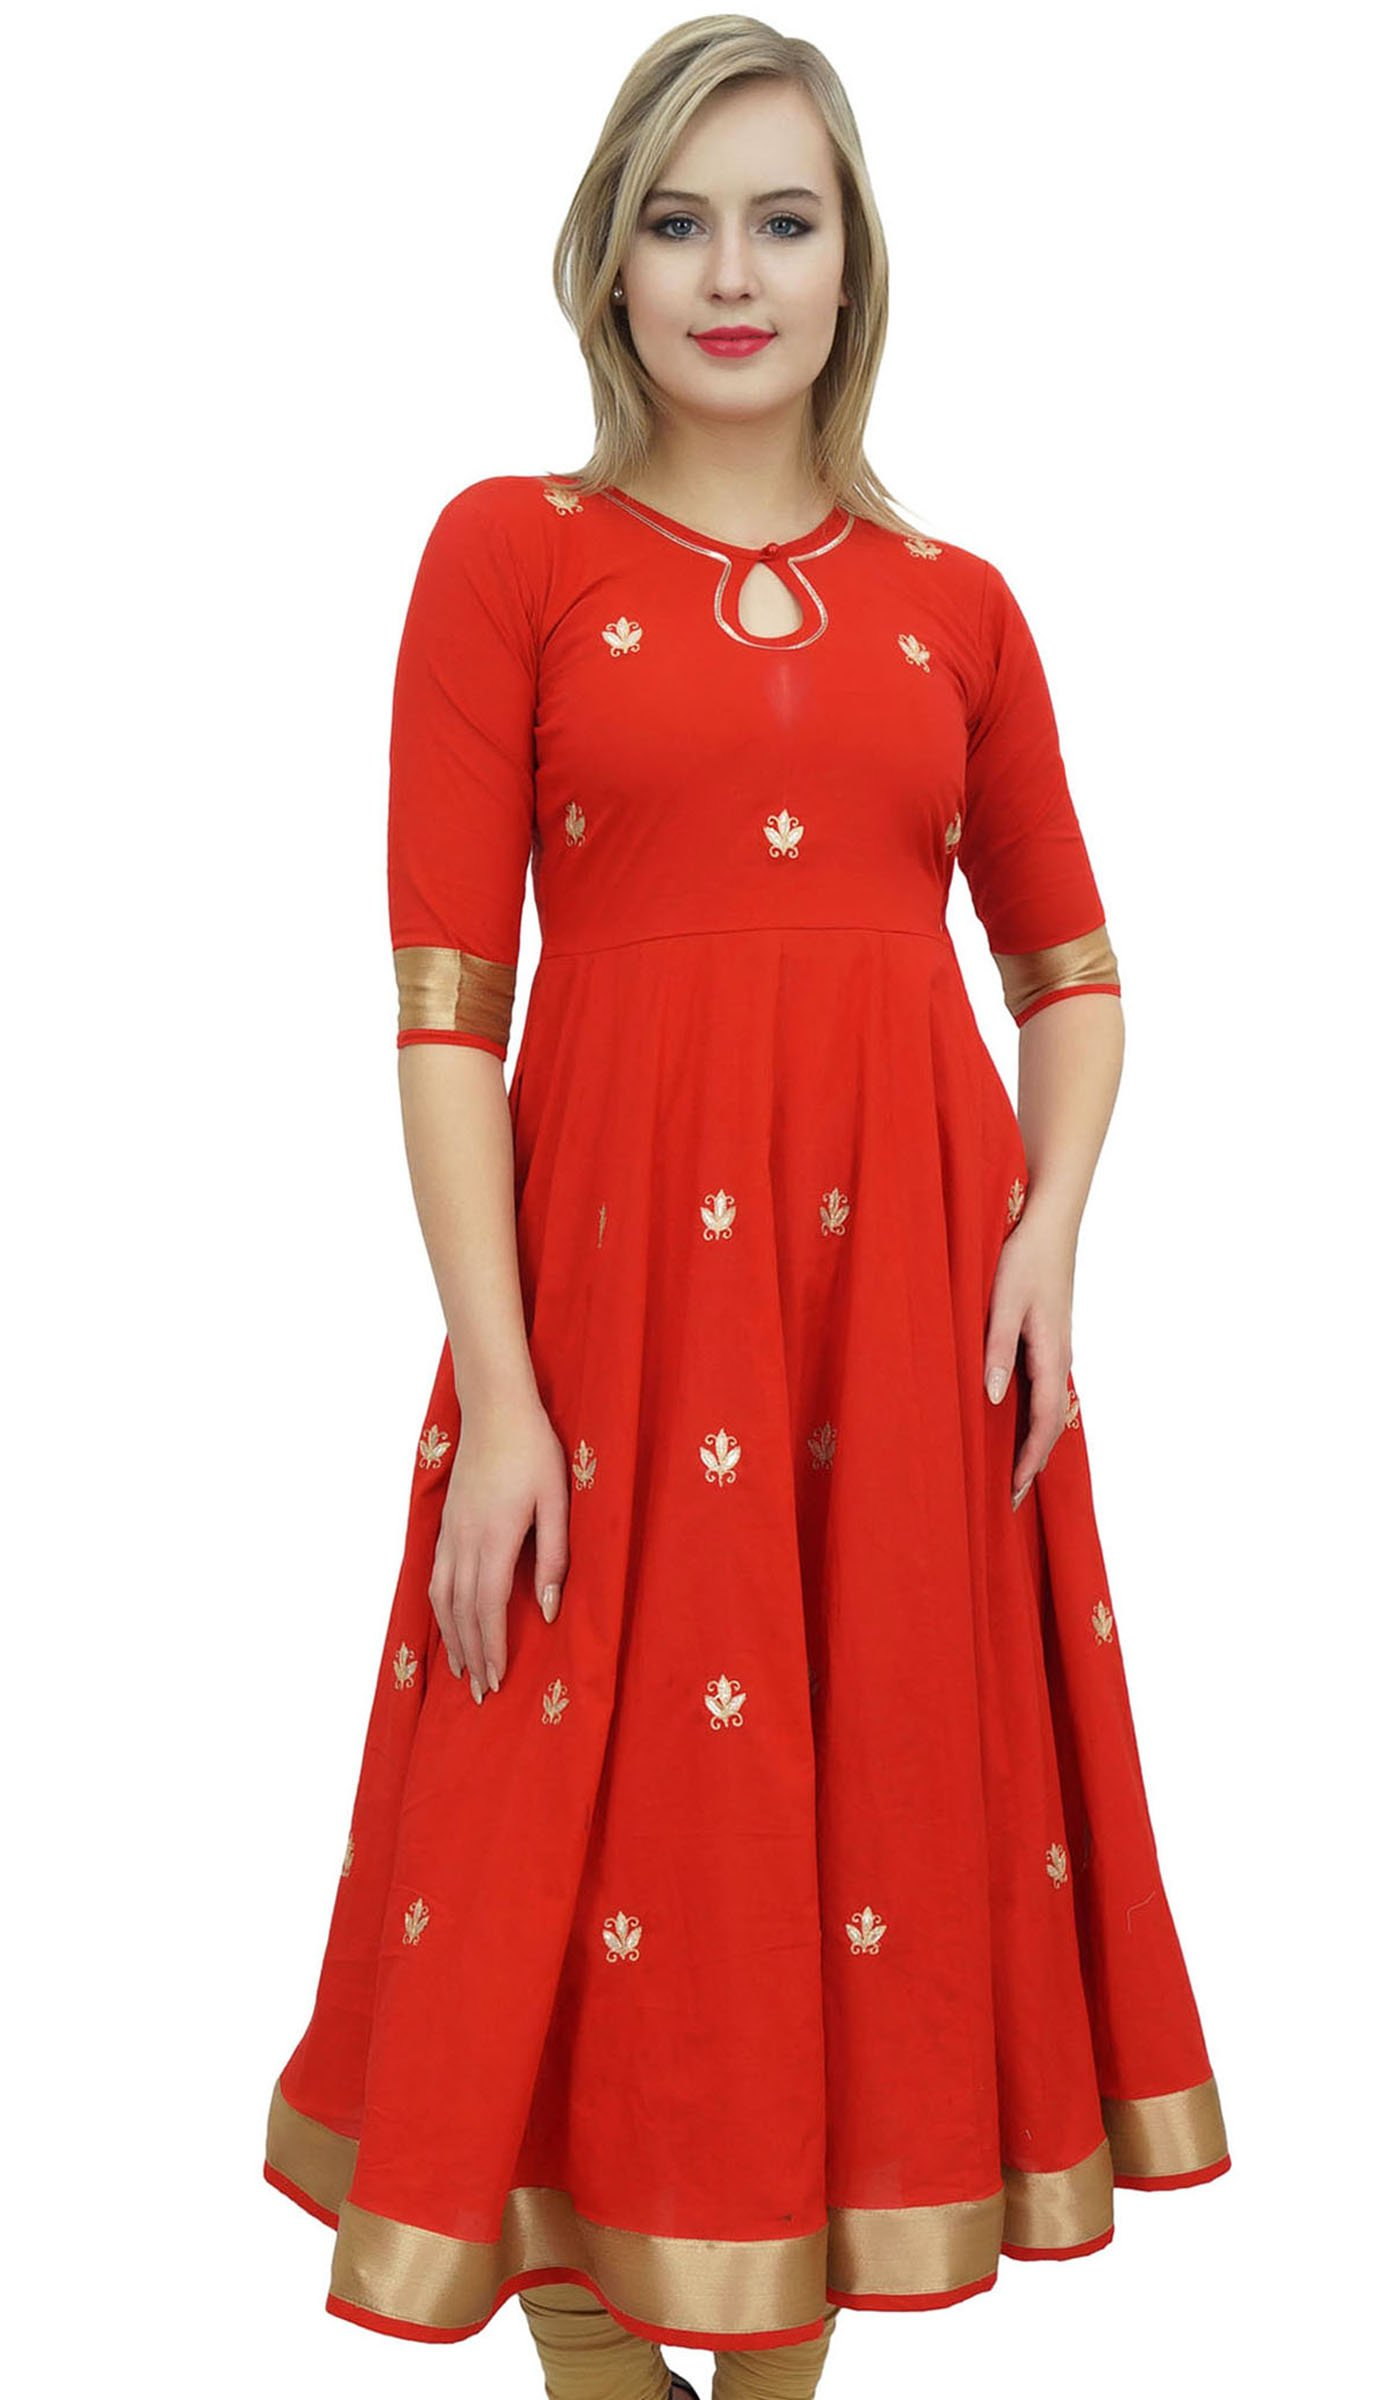 Bimba Designer Red Anarkali Kurta Indian Ethnic Gota Work Cotton Kurti-10